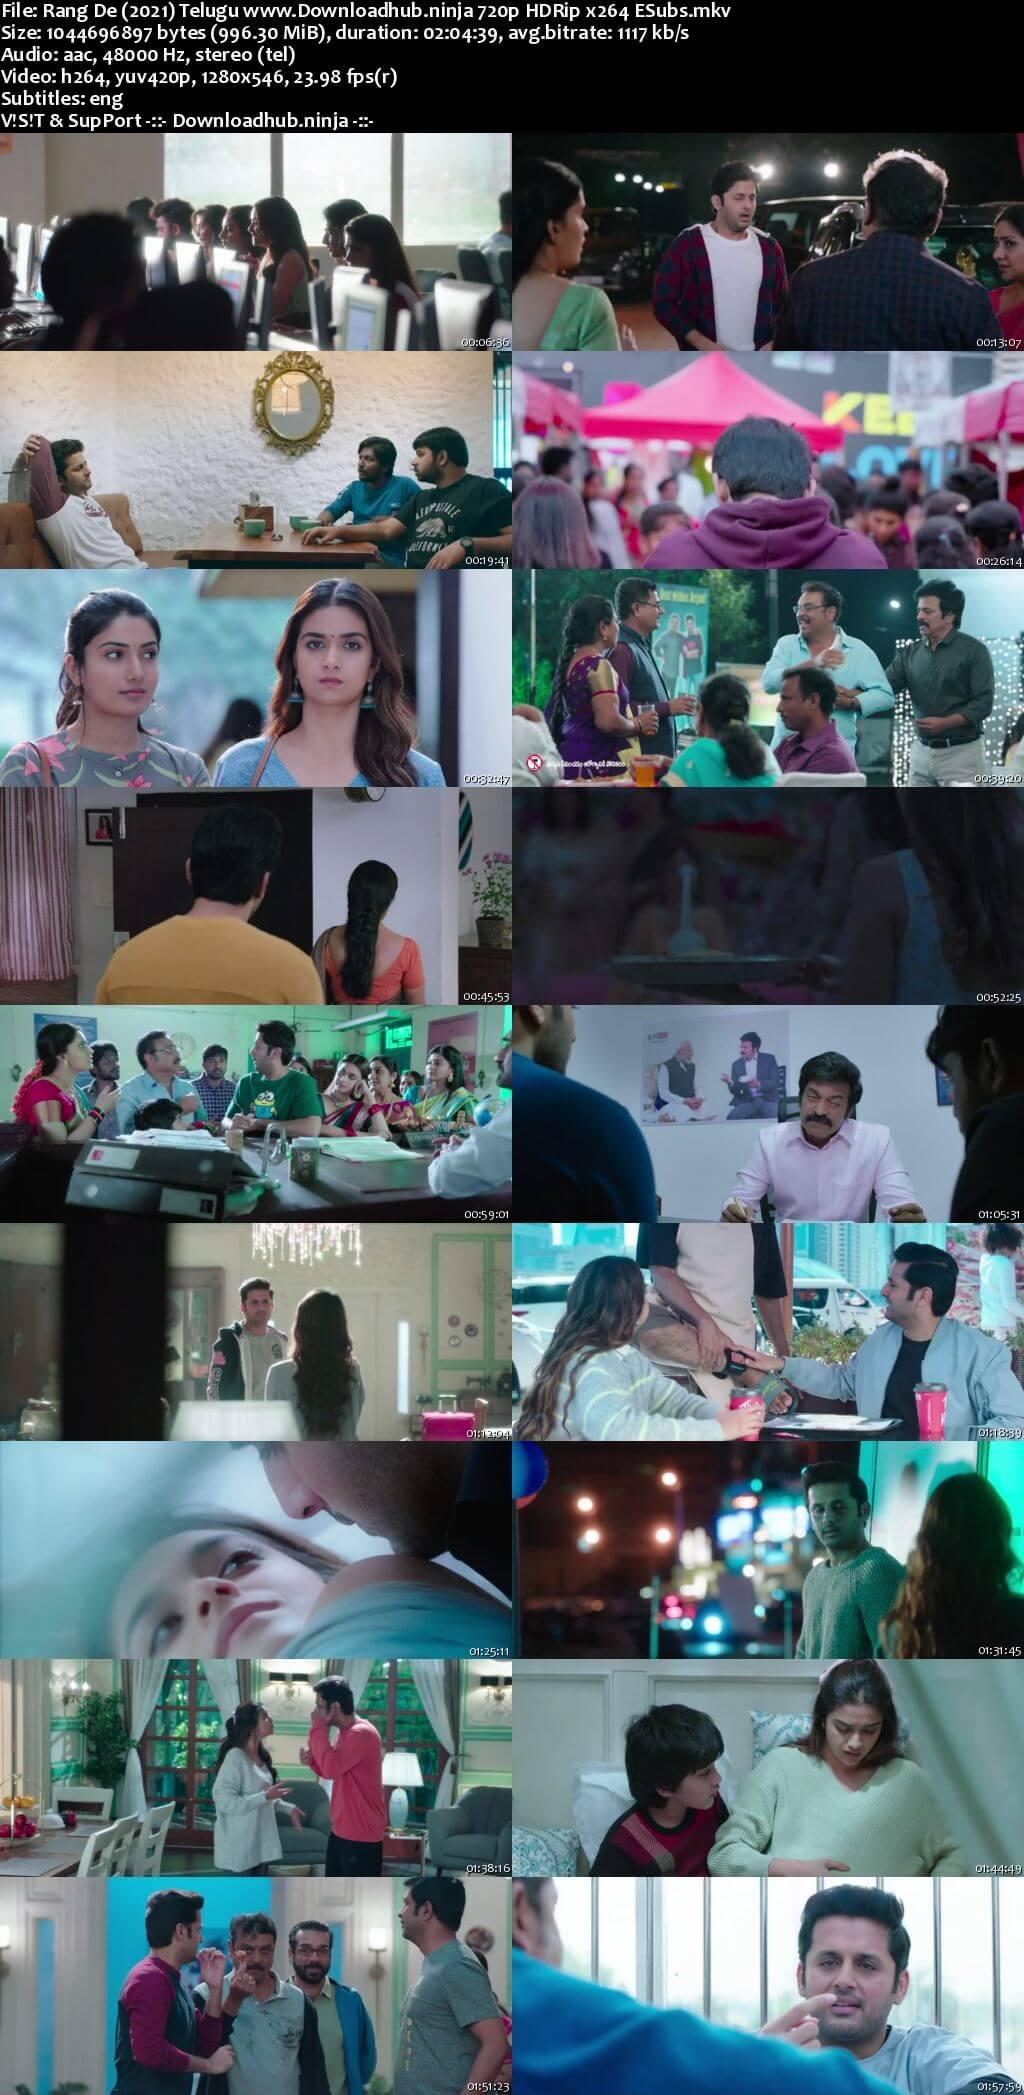 Rang De 2021 Telugu 720p HDRip ESubs